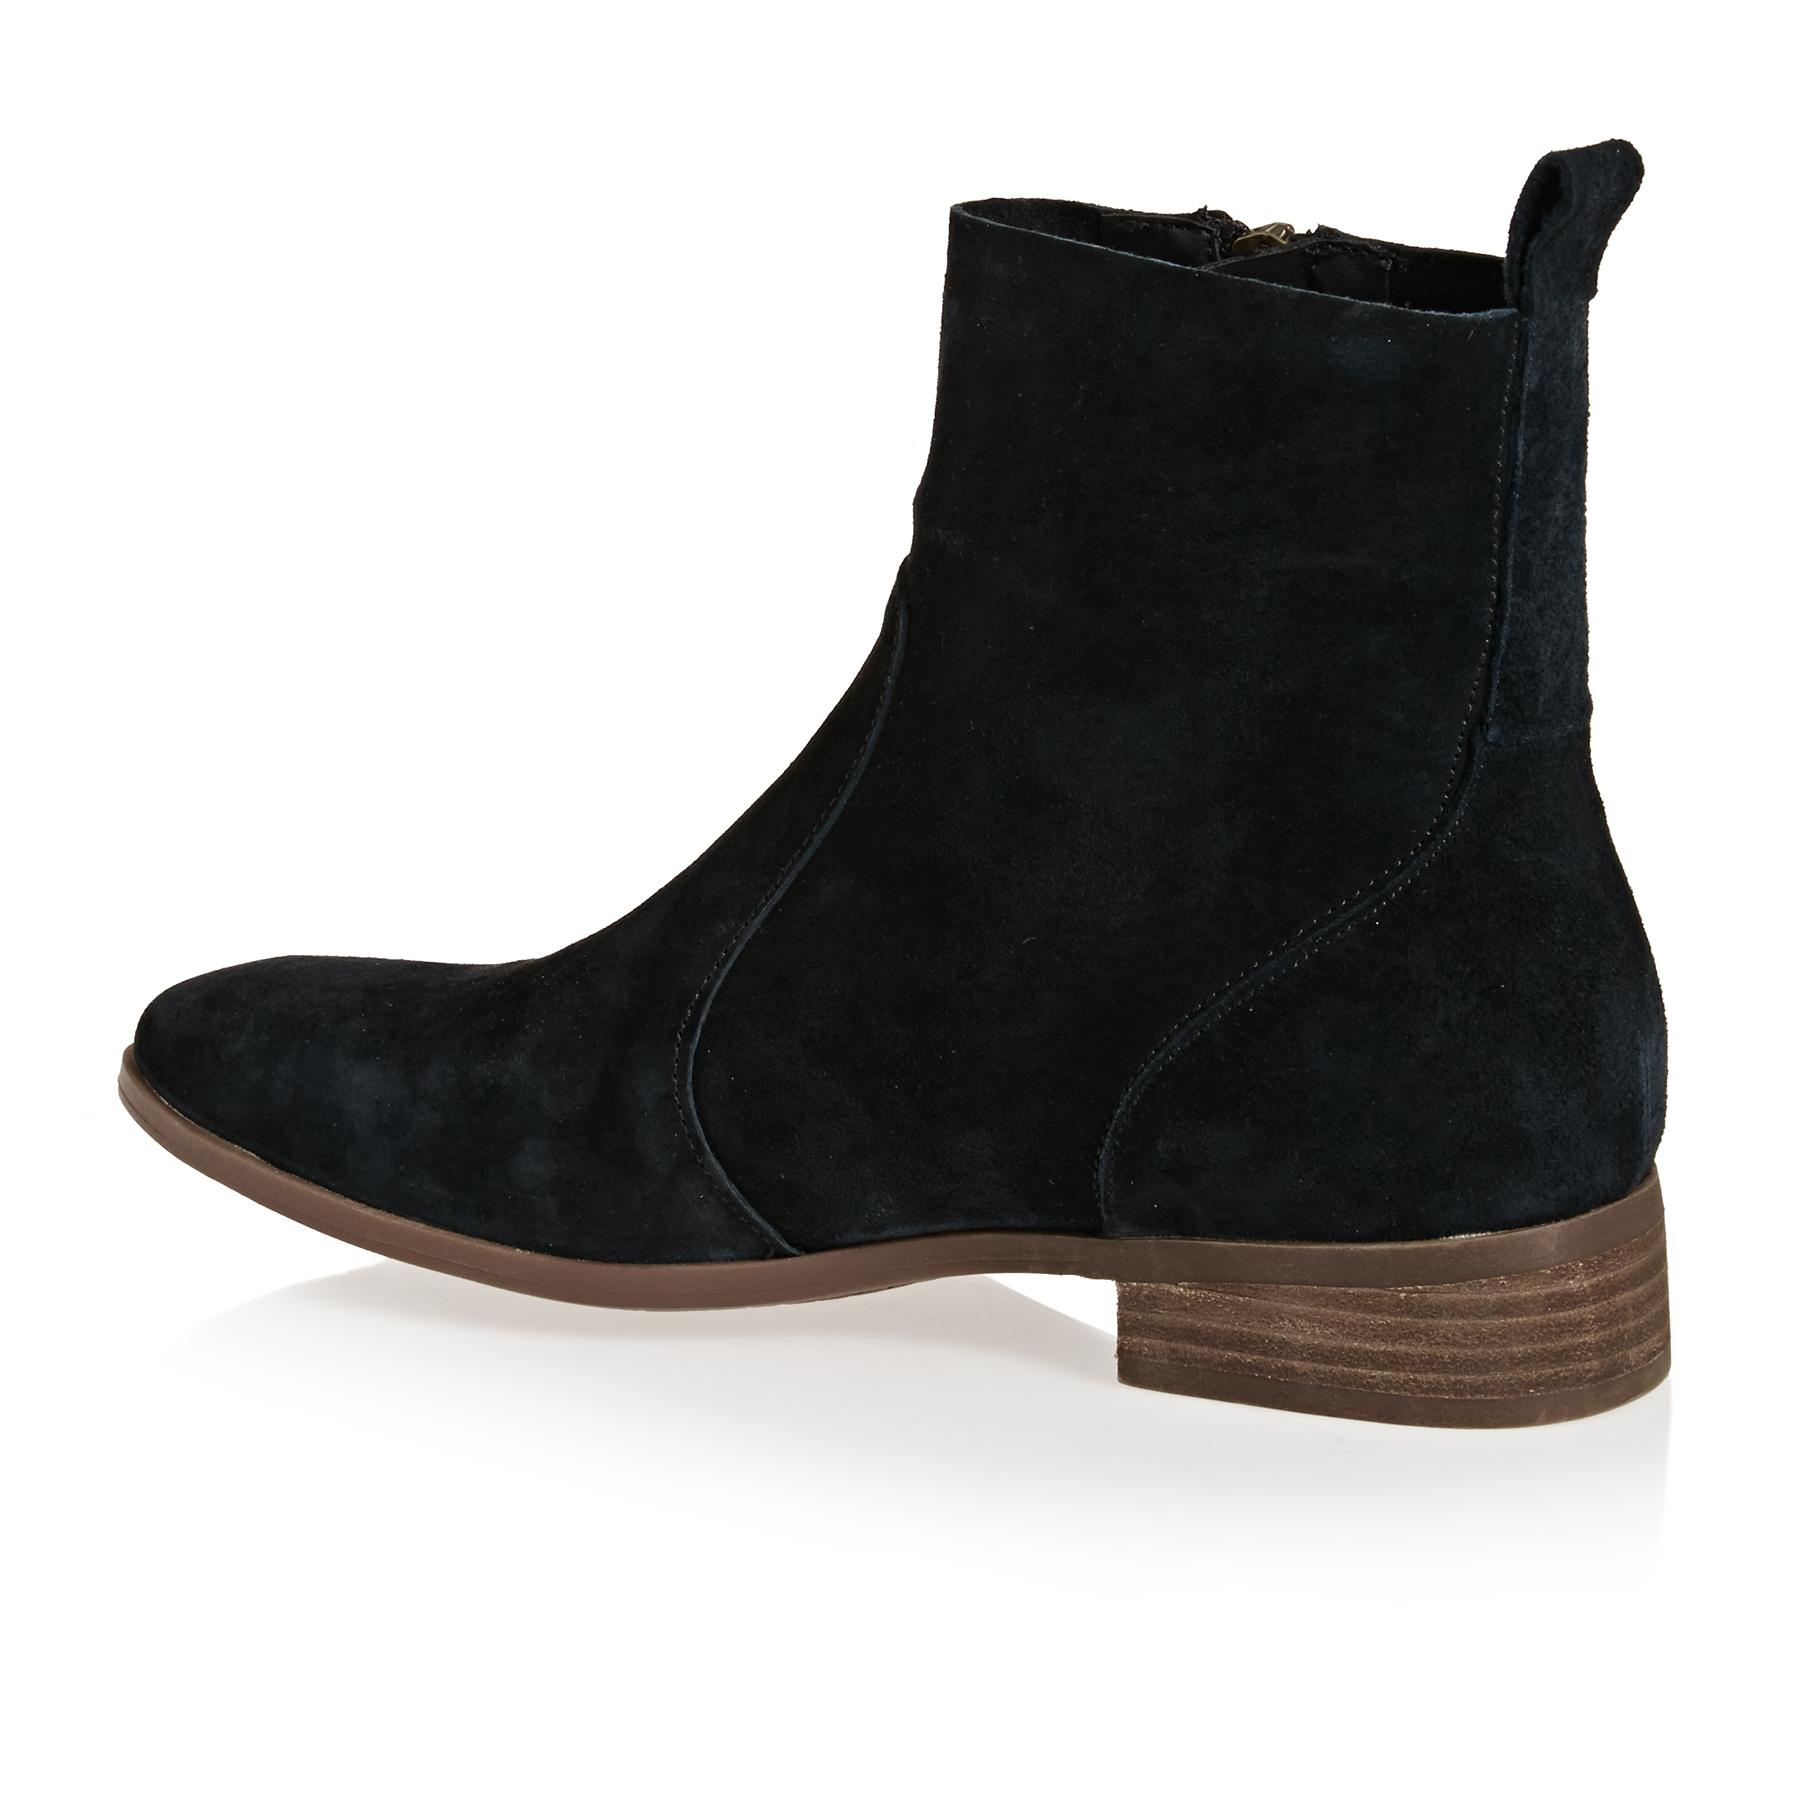 Roxy Eloise Womens Boots